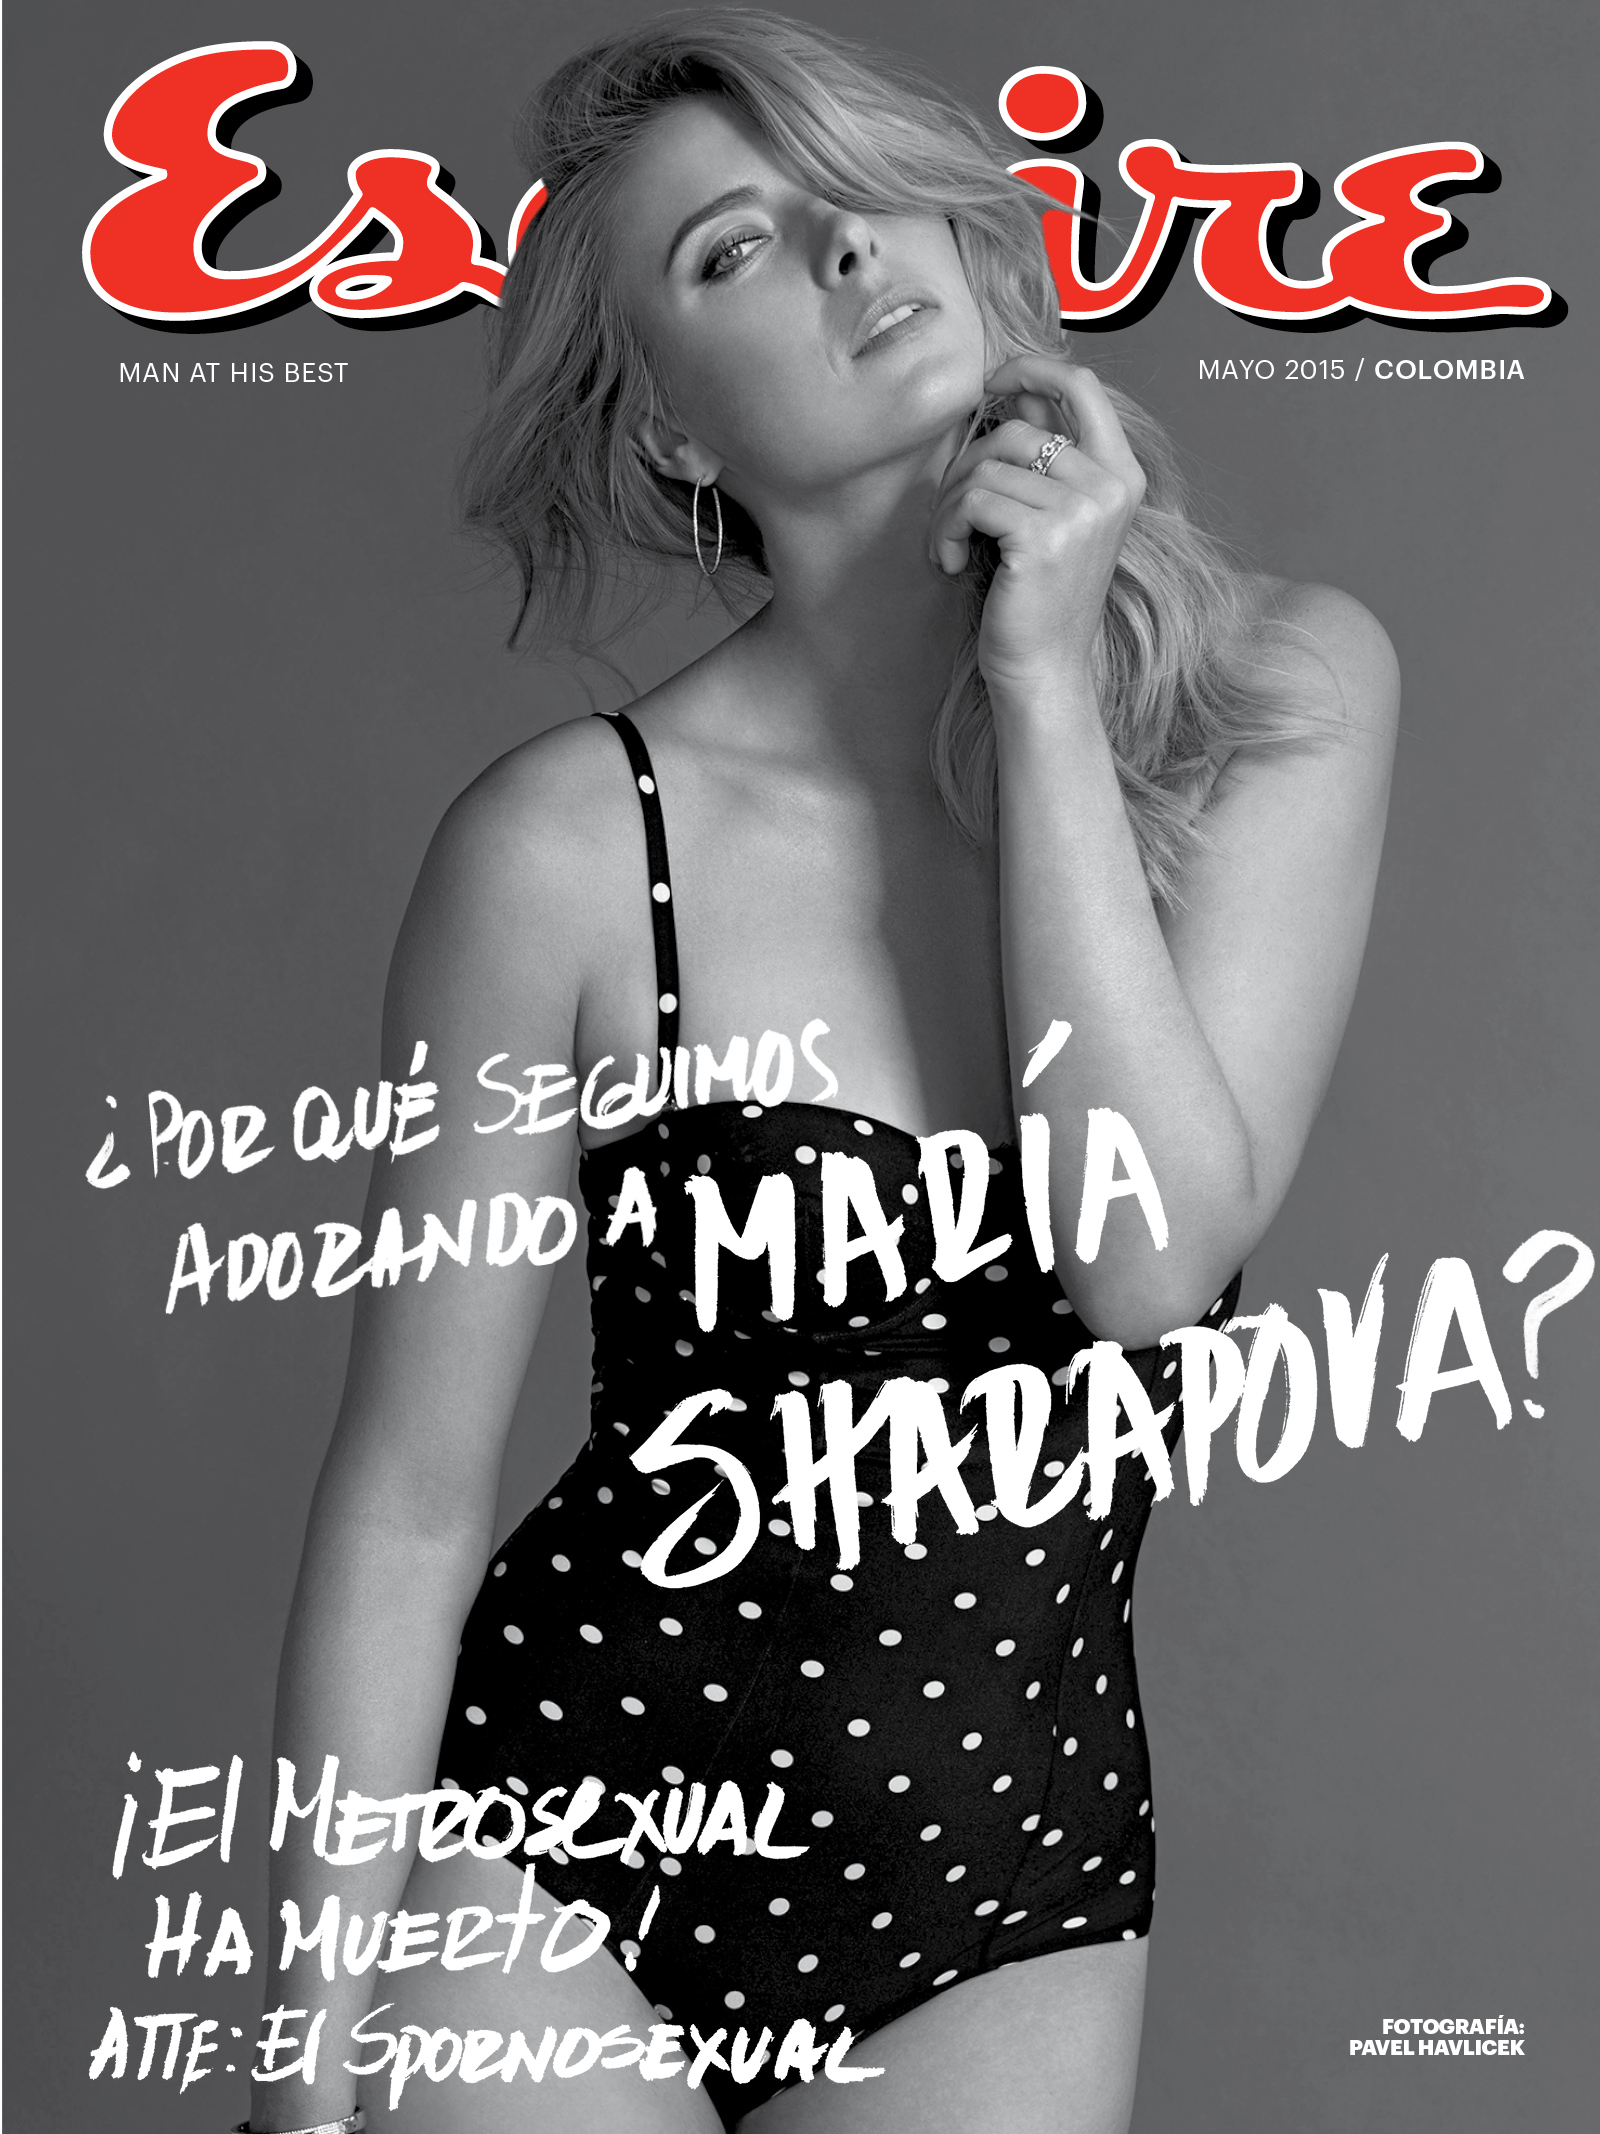 Cover iPad 3-ESQ Colombia-Sharapova[1].jpg